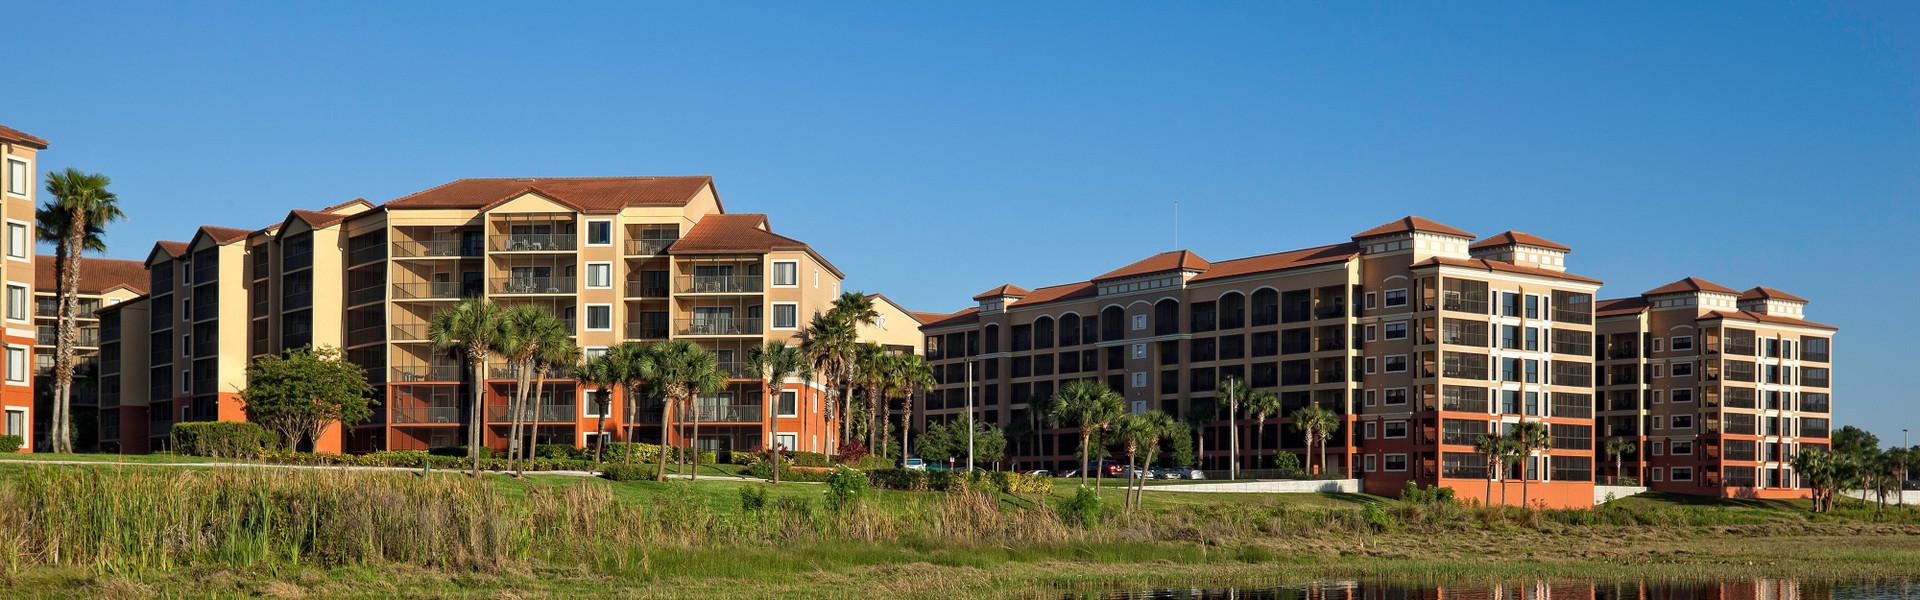 Hotel near Orlando, FL 32819   Florida Resort